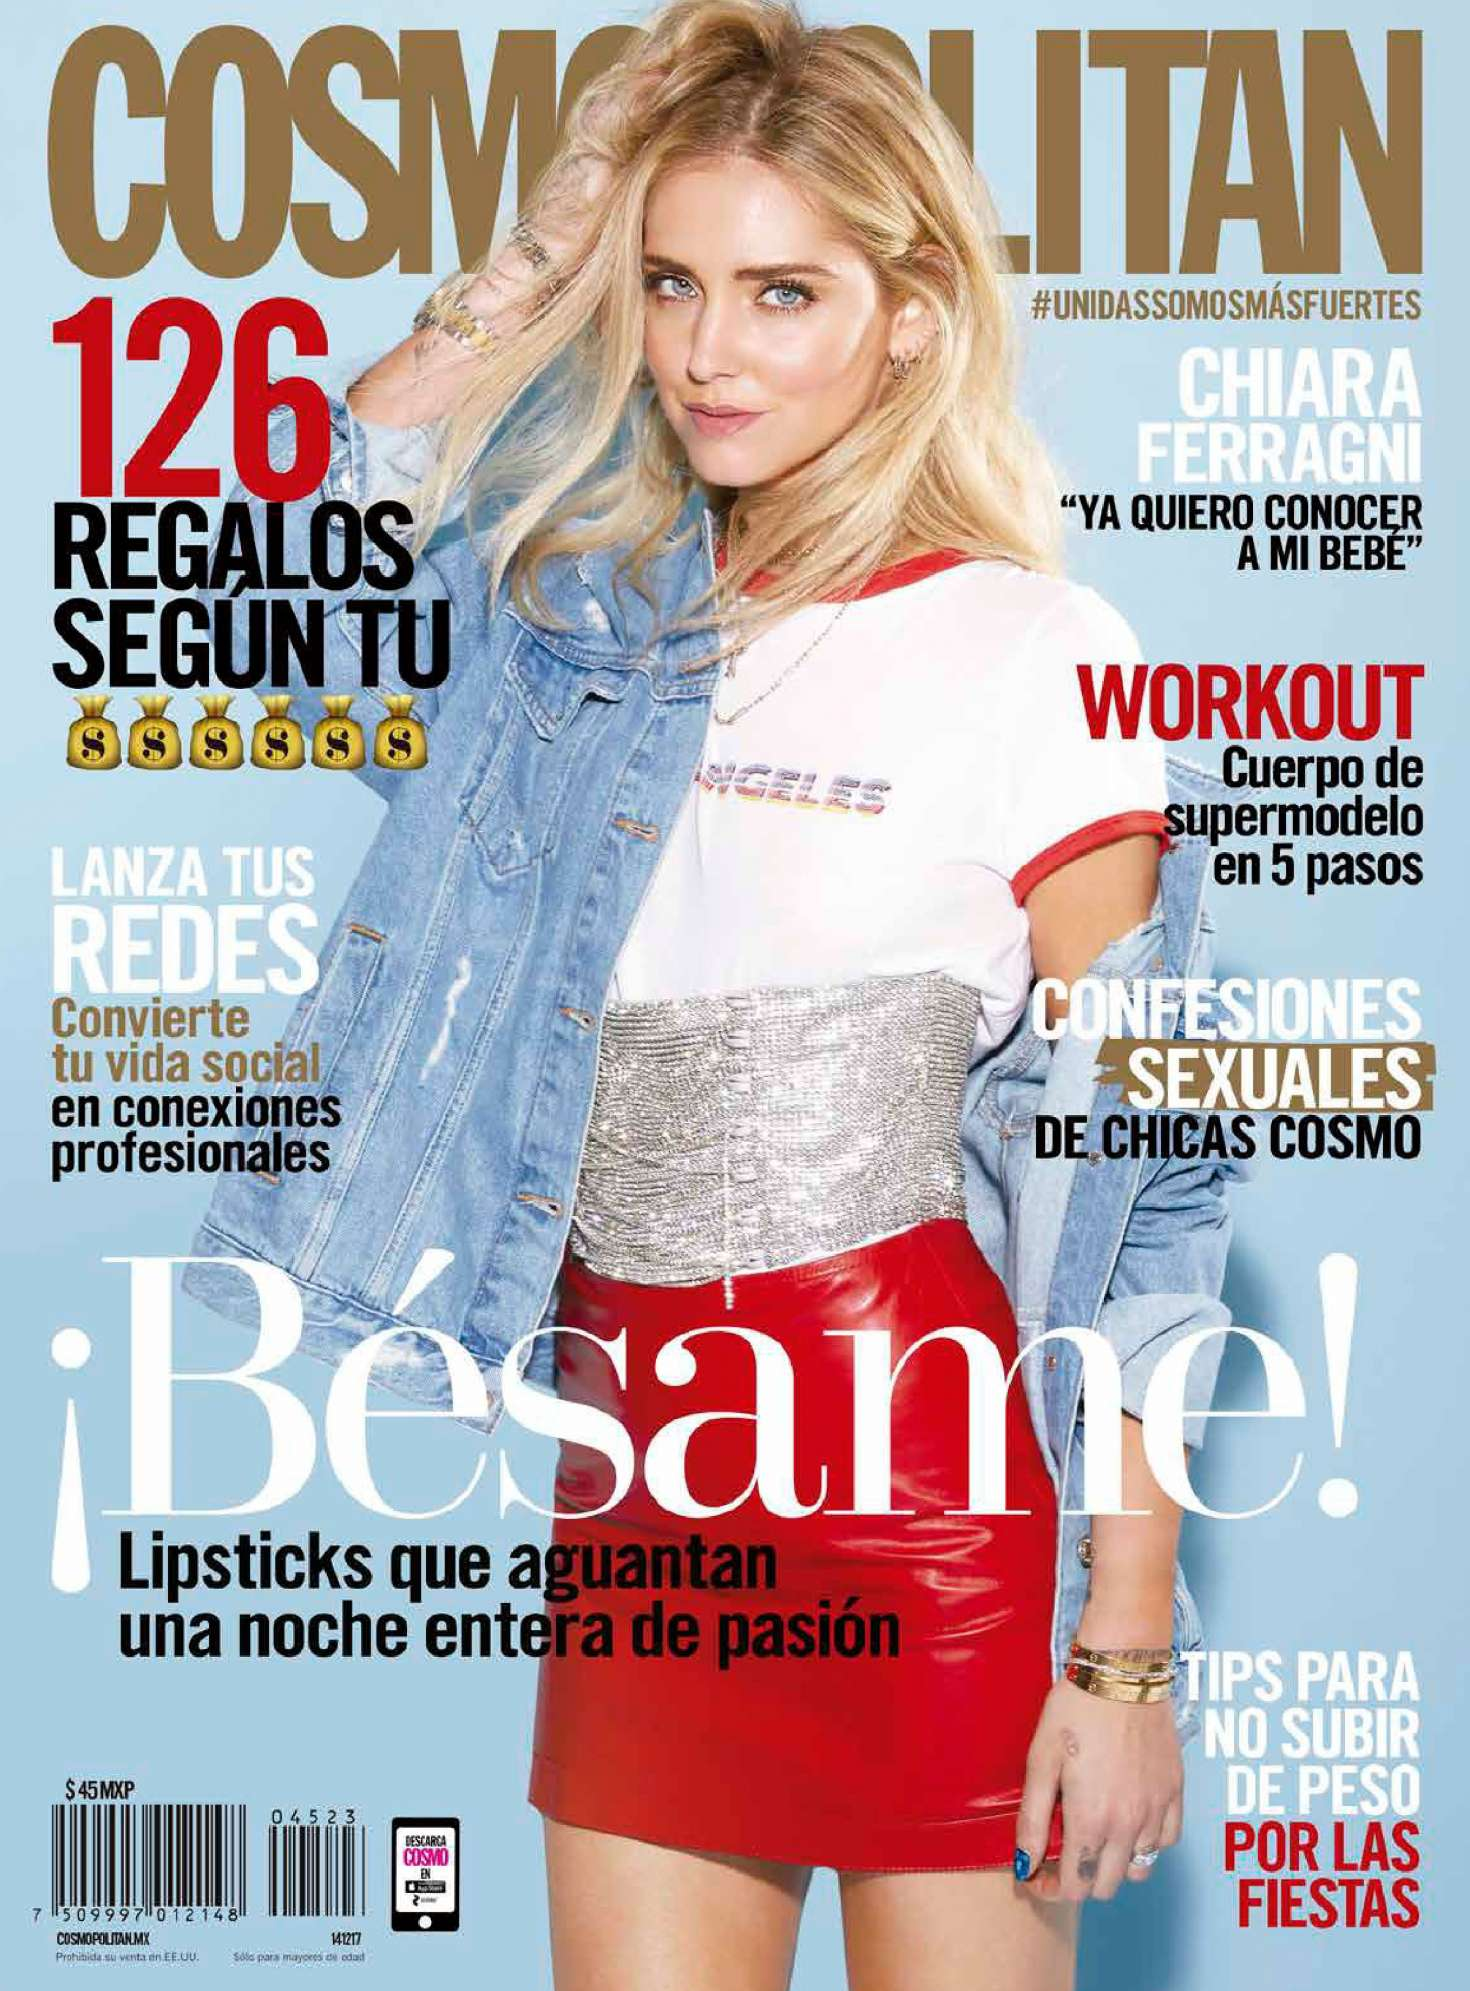 Most Popular Fashion Magazines - Alux.com